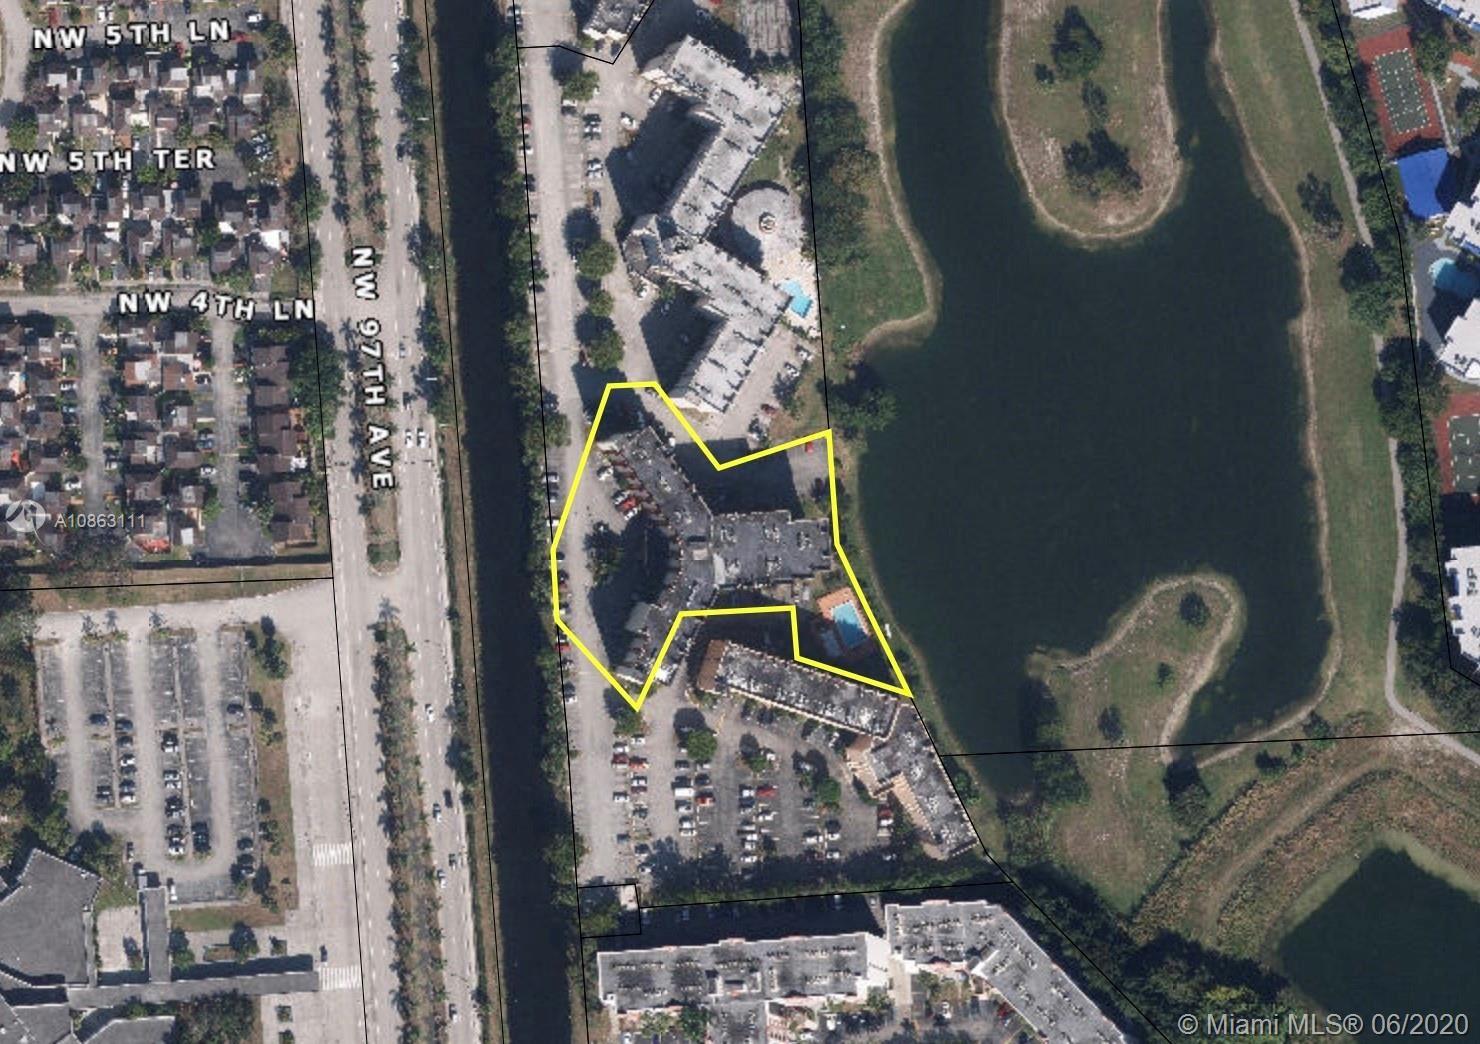 9351 Fontainebleau Blvd #B106, Miami, FL 33172 - #: A10863111